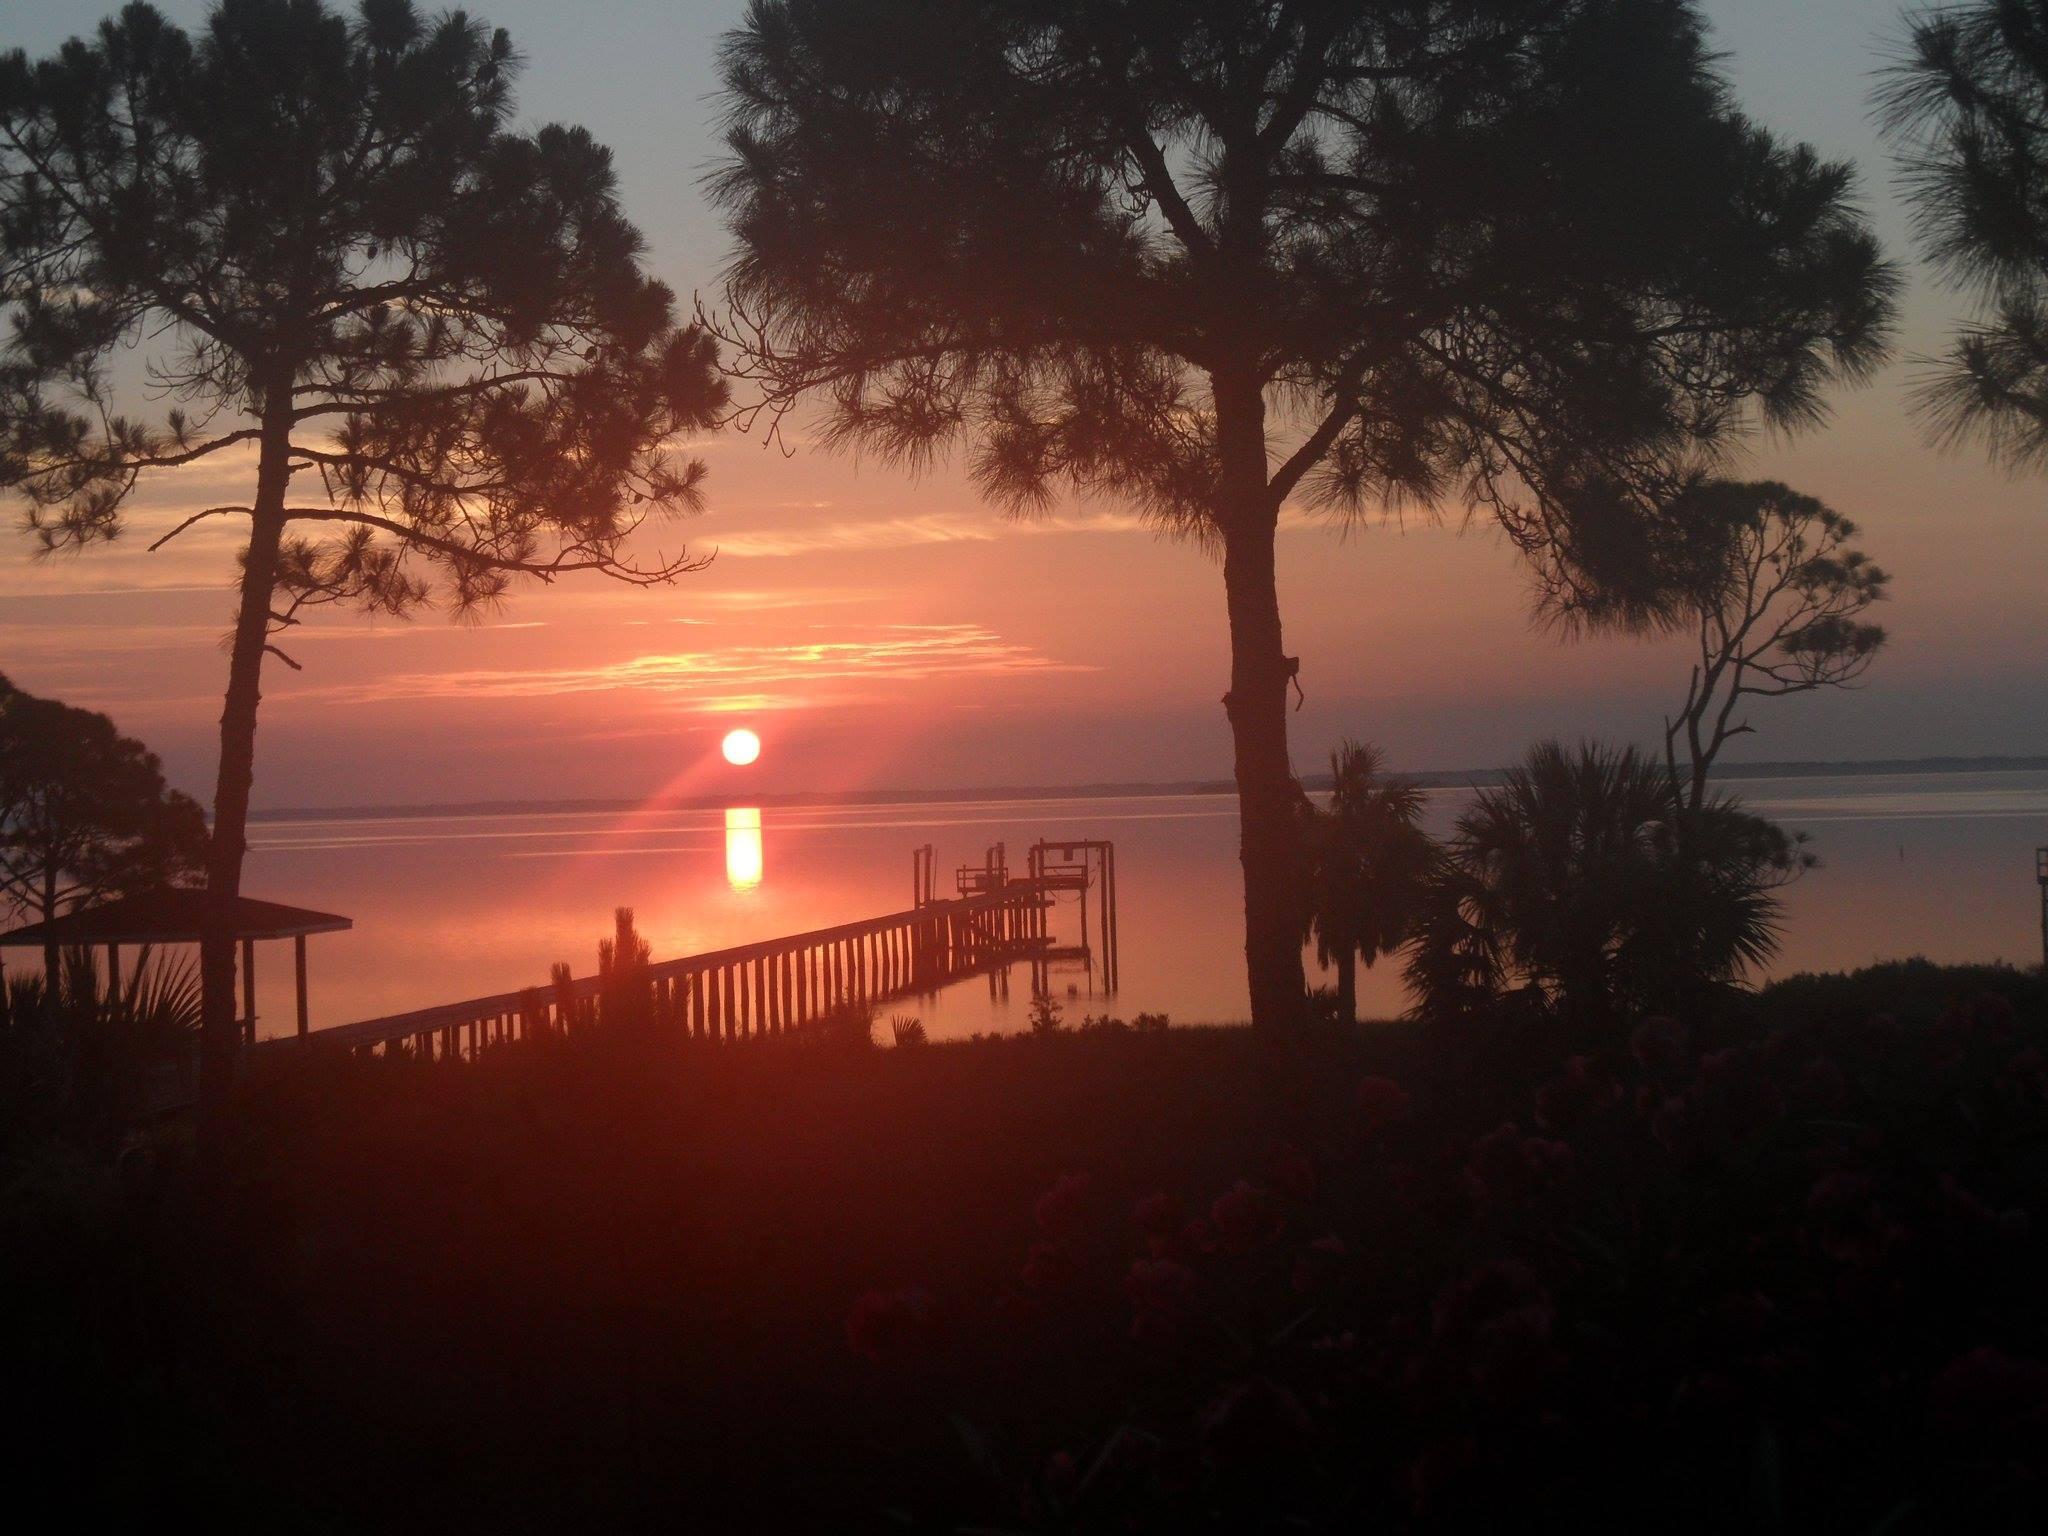 Sunset Reflections Natural Retreats Cape San Blas Sunset